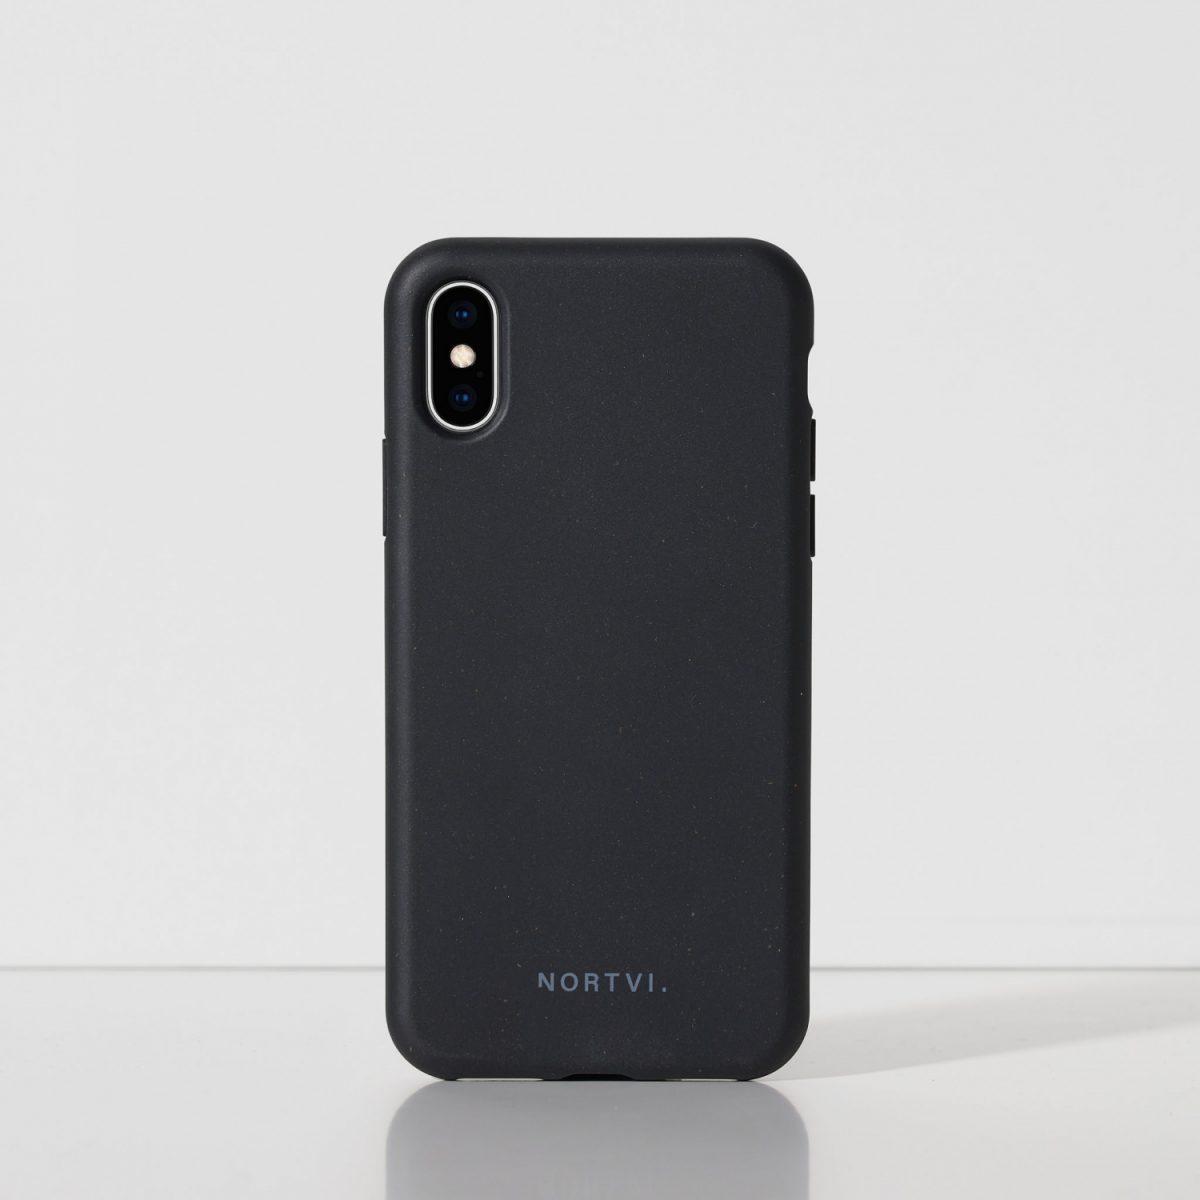 NORTVI black phone case for iPhone XS case